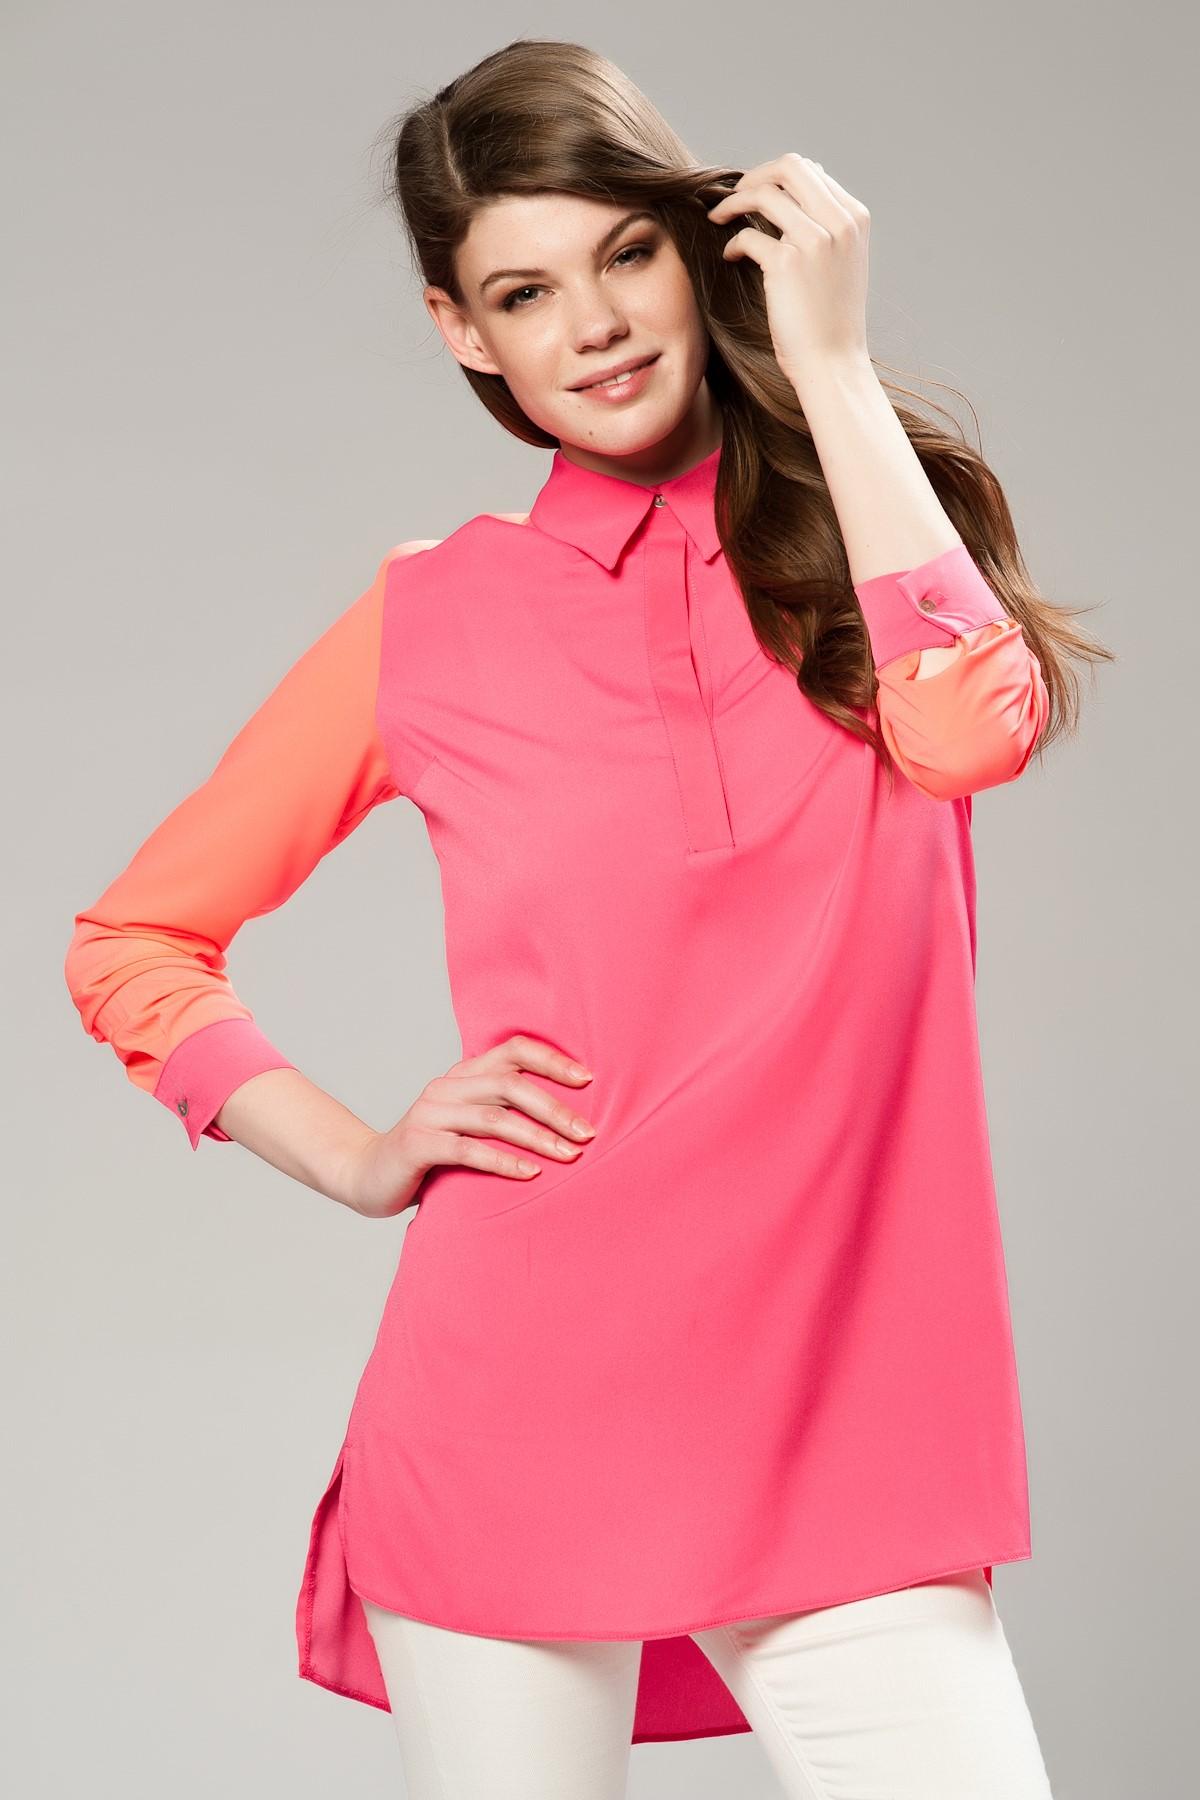 En Güzel Vavist Tunik Modeli